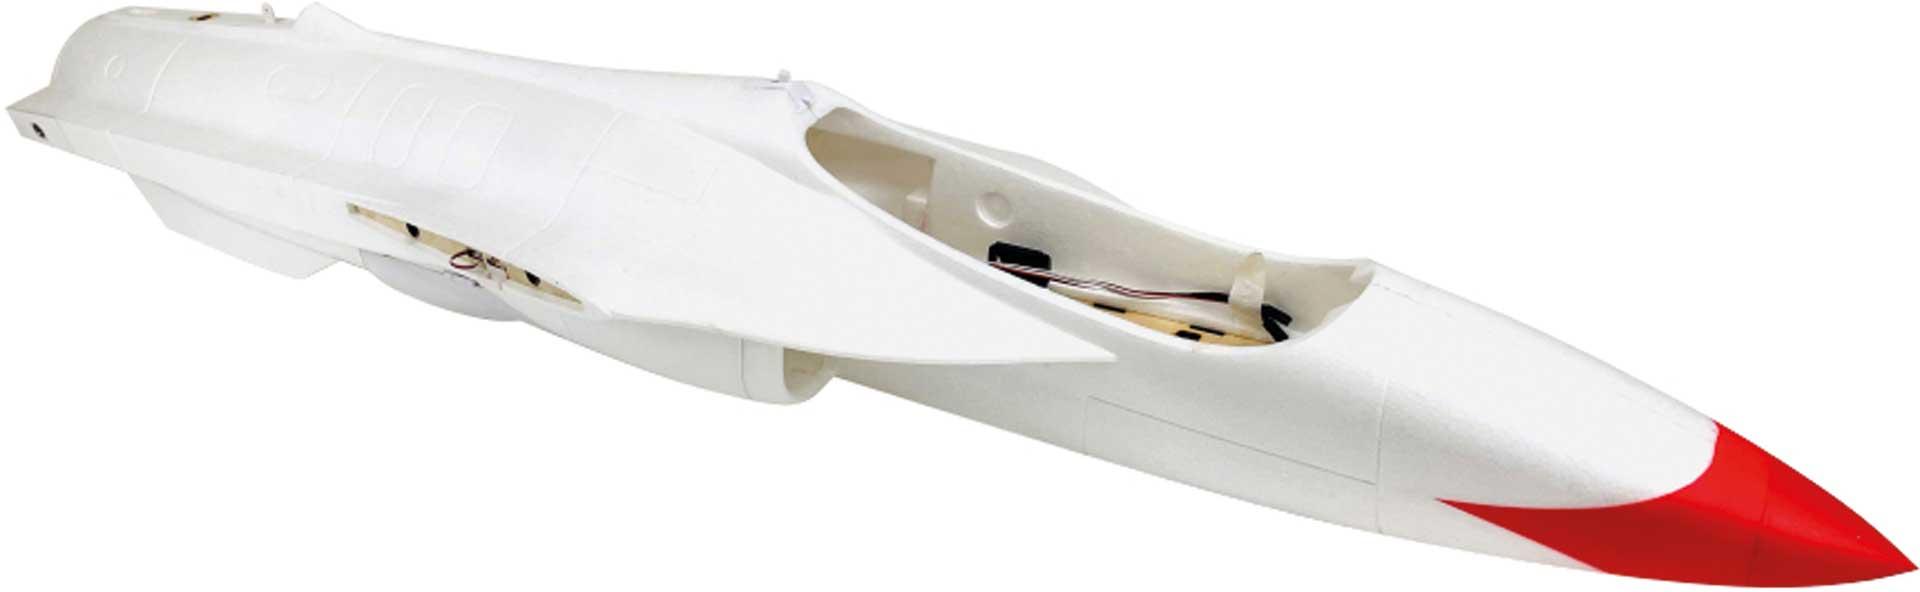 Premier Aircraft Flexjet Rumpf ohne Deckel Rot Thunderbird